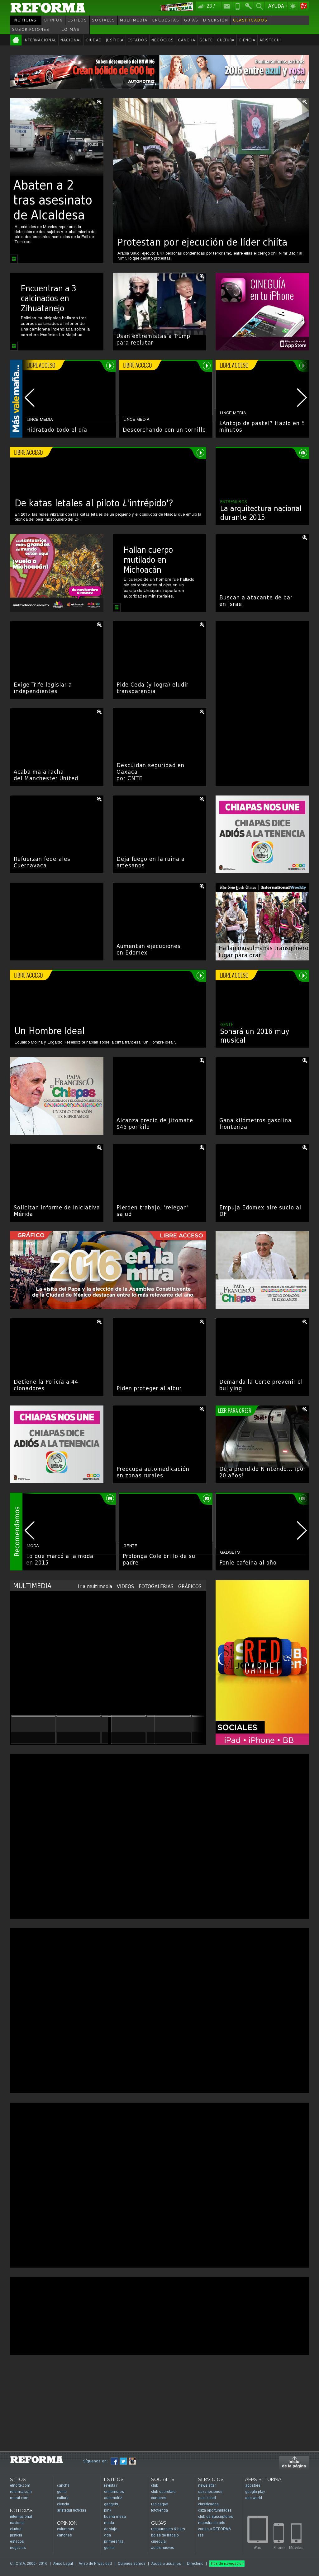 Reforma.com at Saturday Jan. 2, 2016, 9:20 p.m. UTC